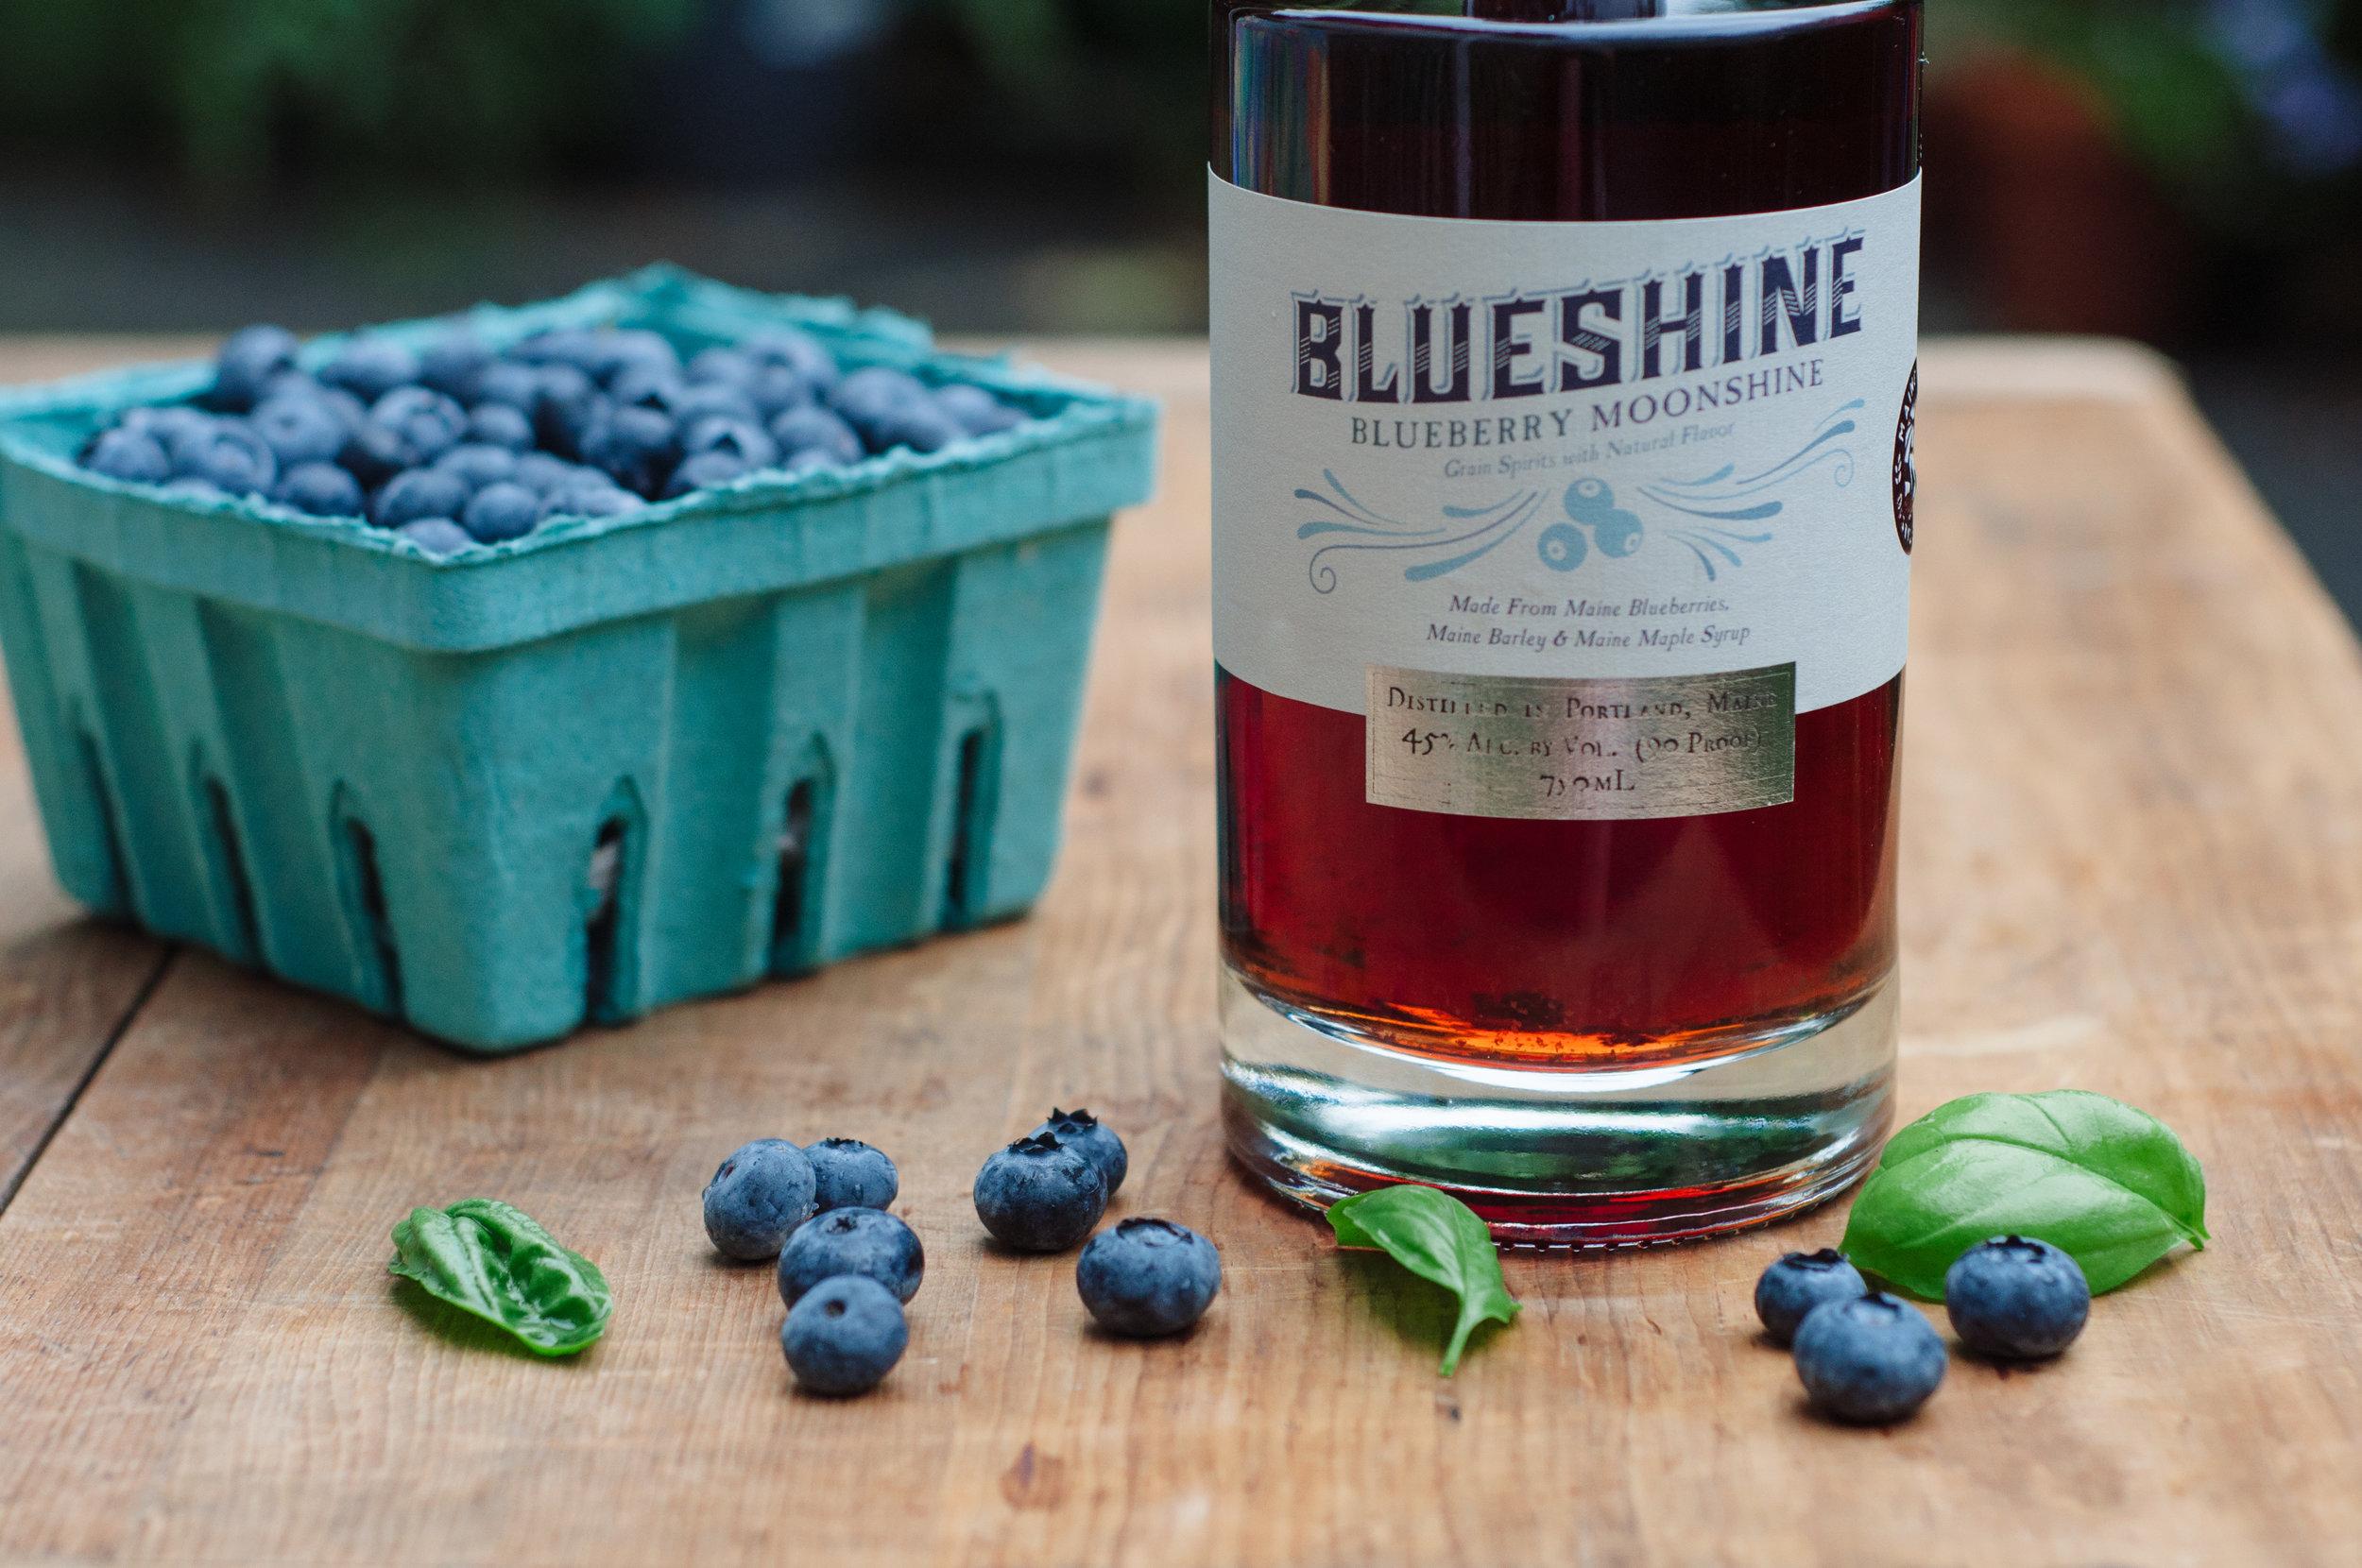 Blueshine-5.jpg